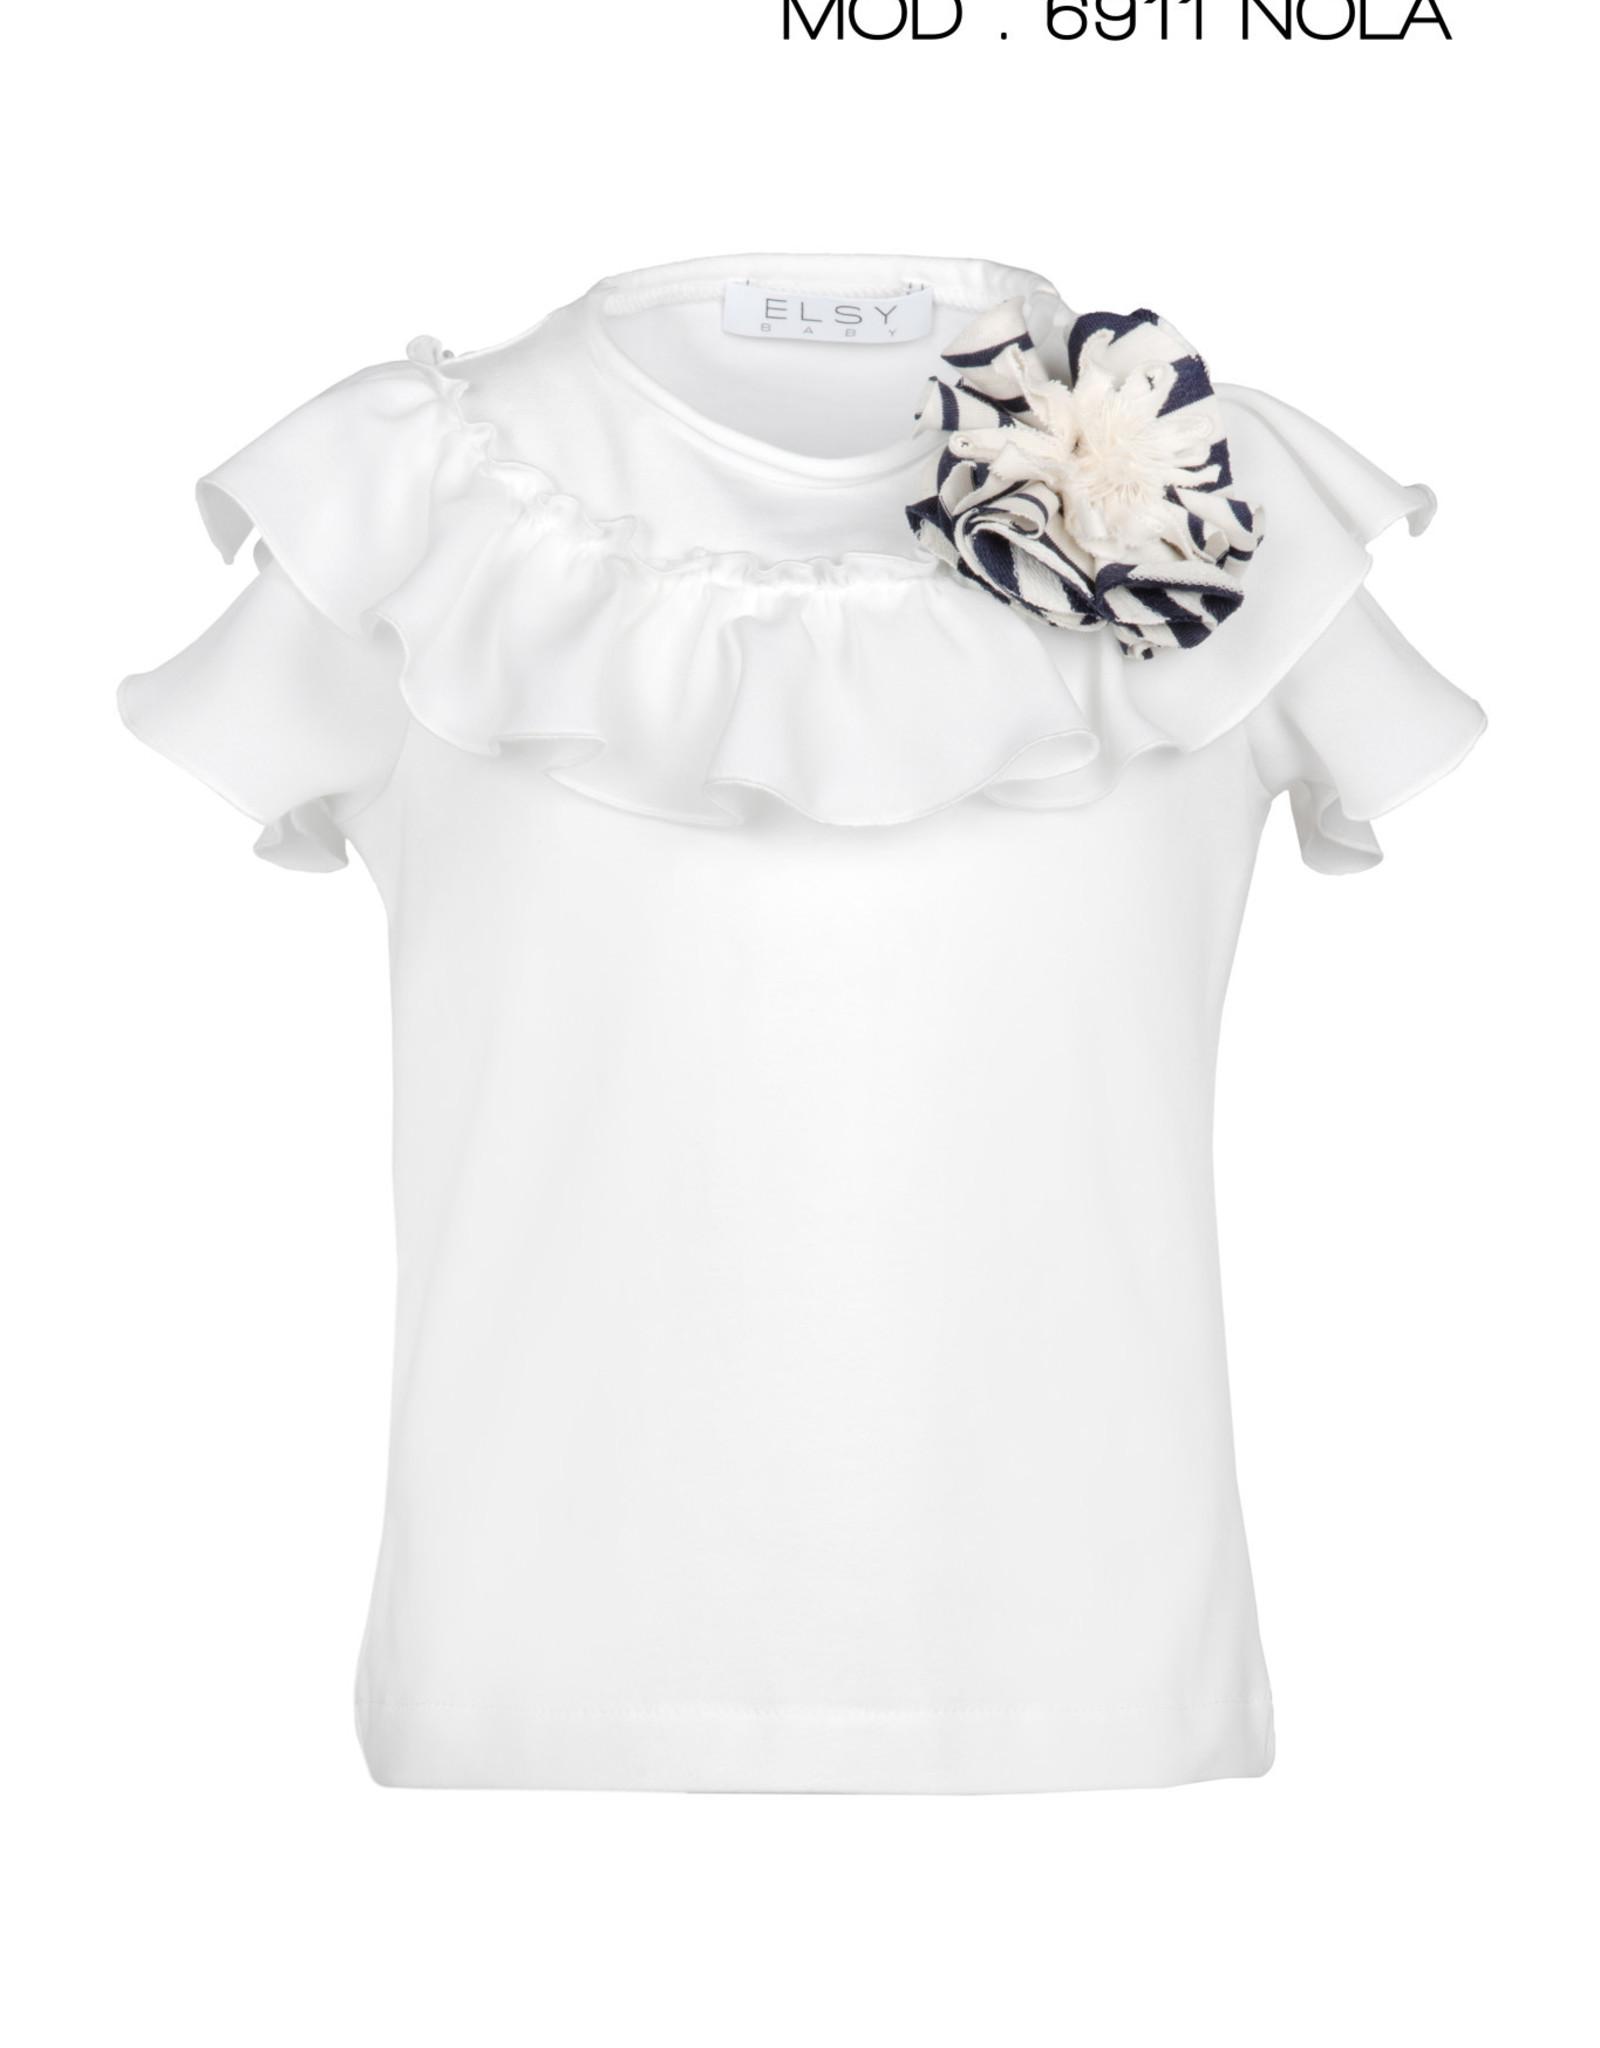 ELSY ELSY Nola t-shirt